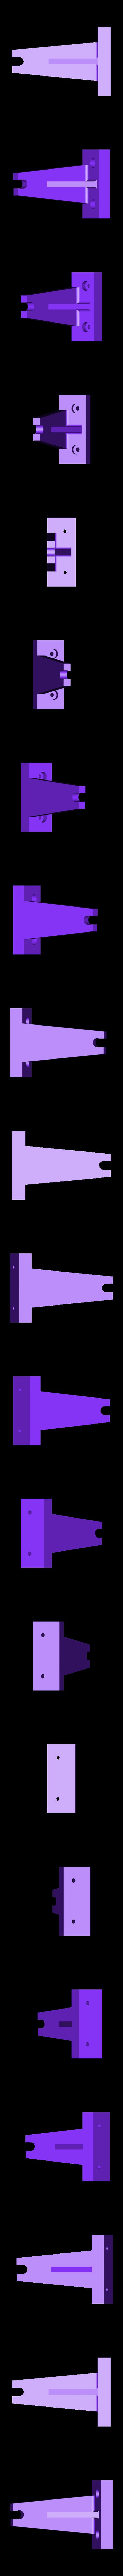 Rotate-Tool02.stl Download free STL file Turboprop Engine Modified Parts (No.2) • 3D printable design, konchan77